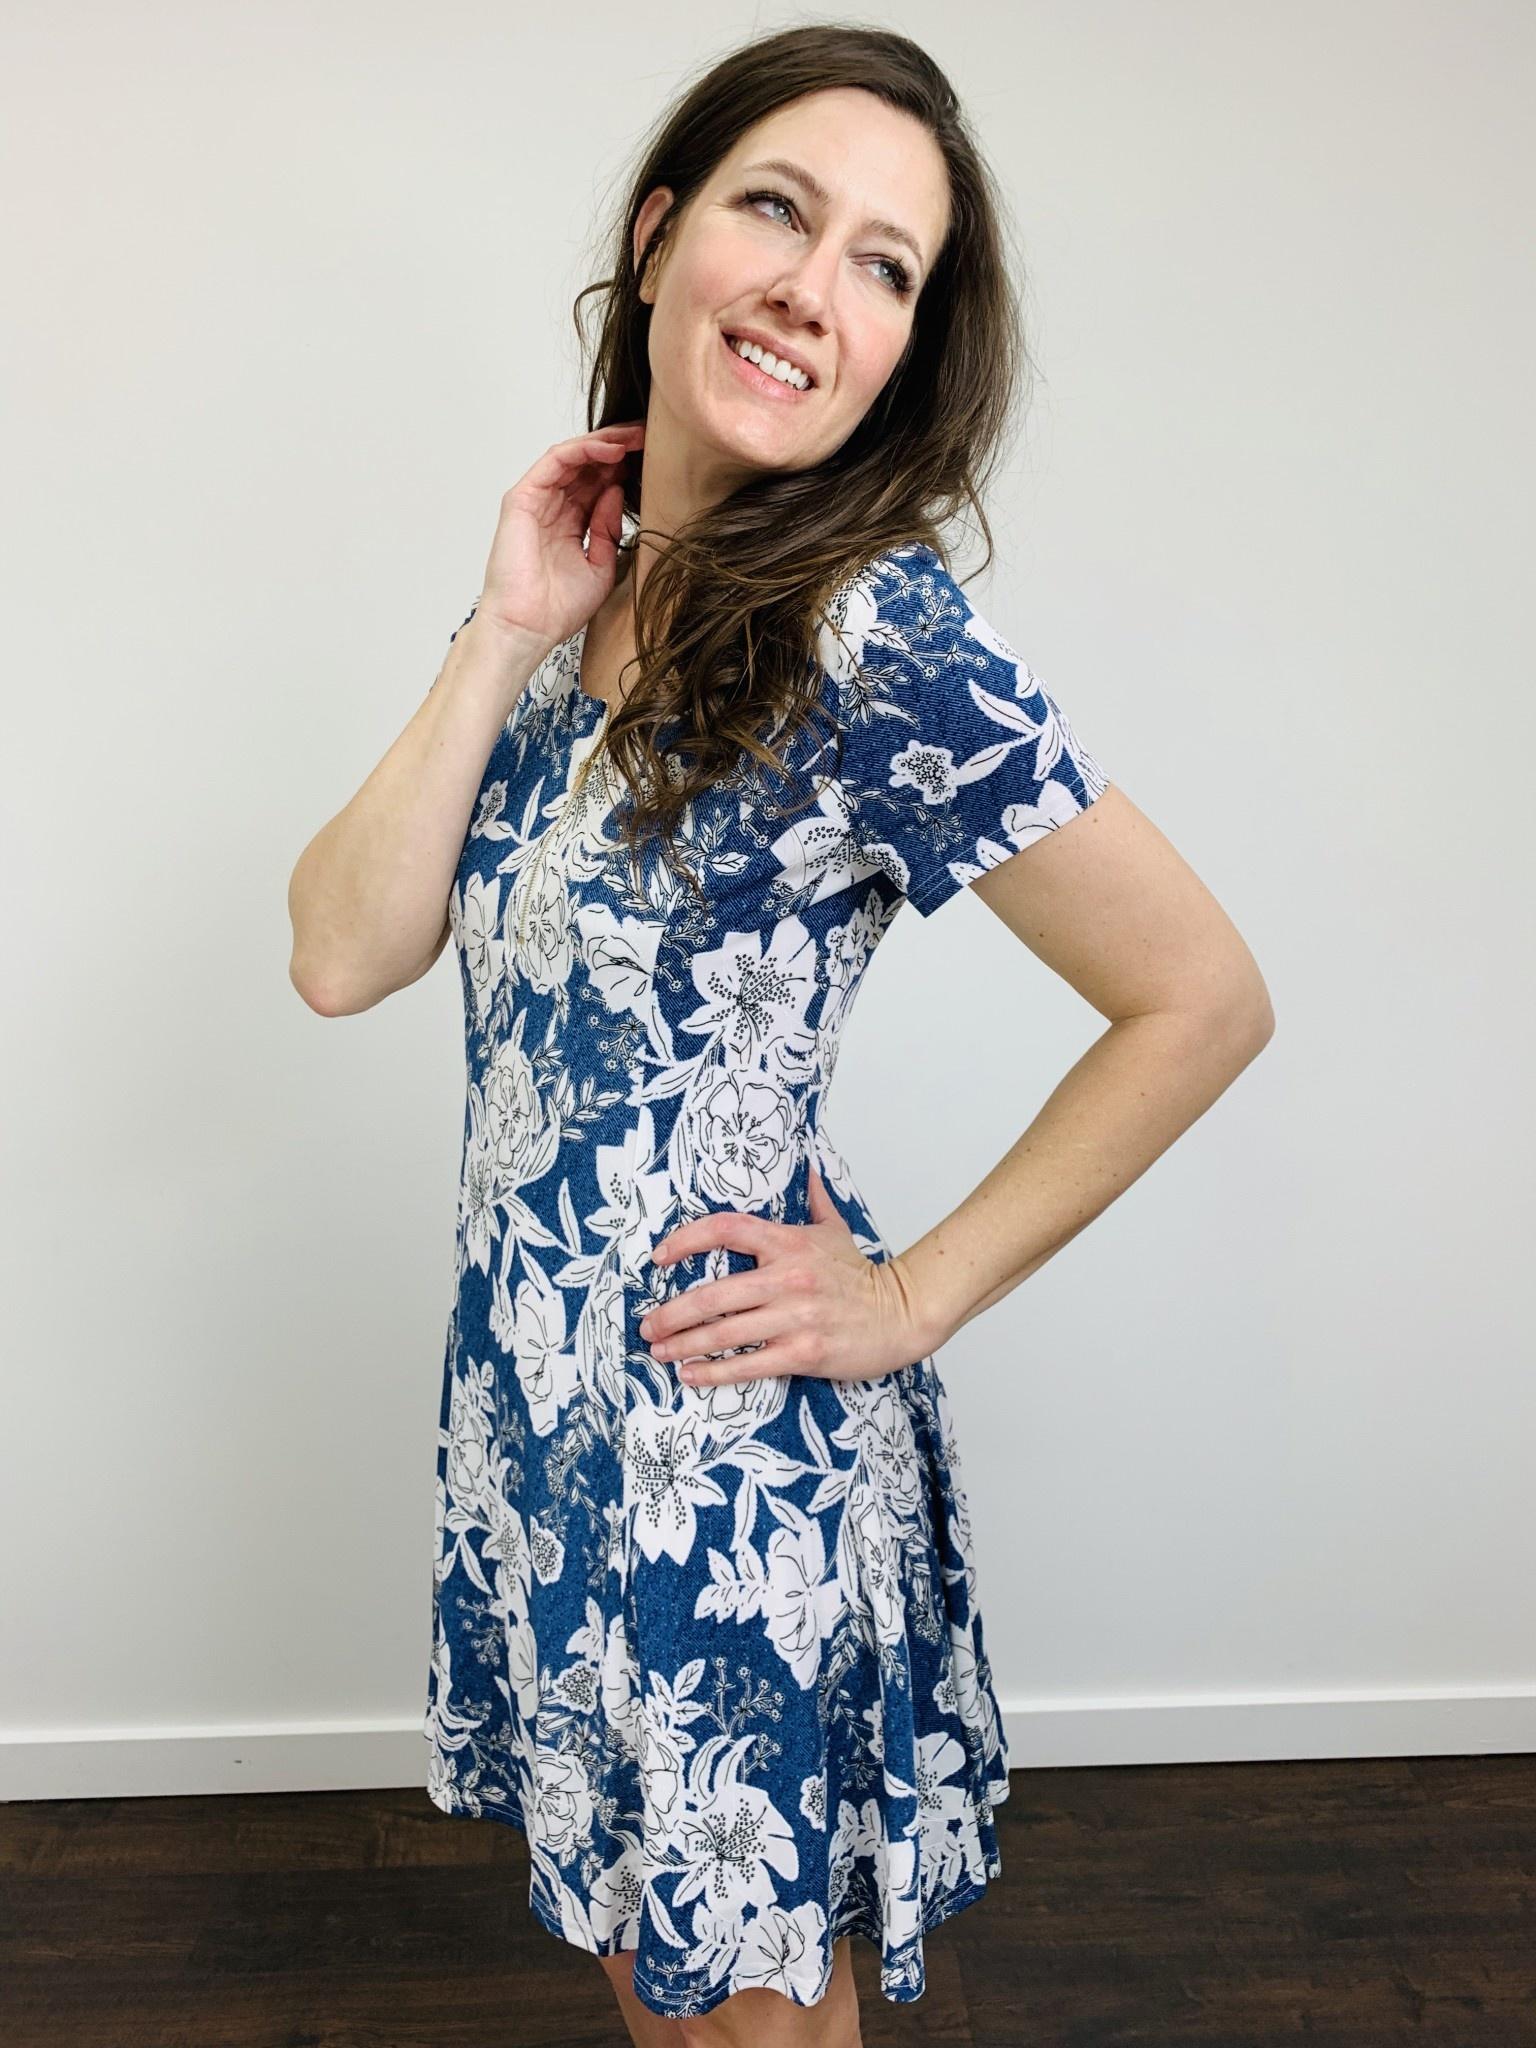 Papillon Textured Cap Sleeve Floral Dress in Blue